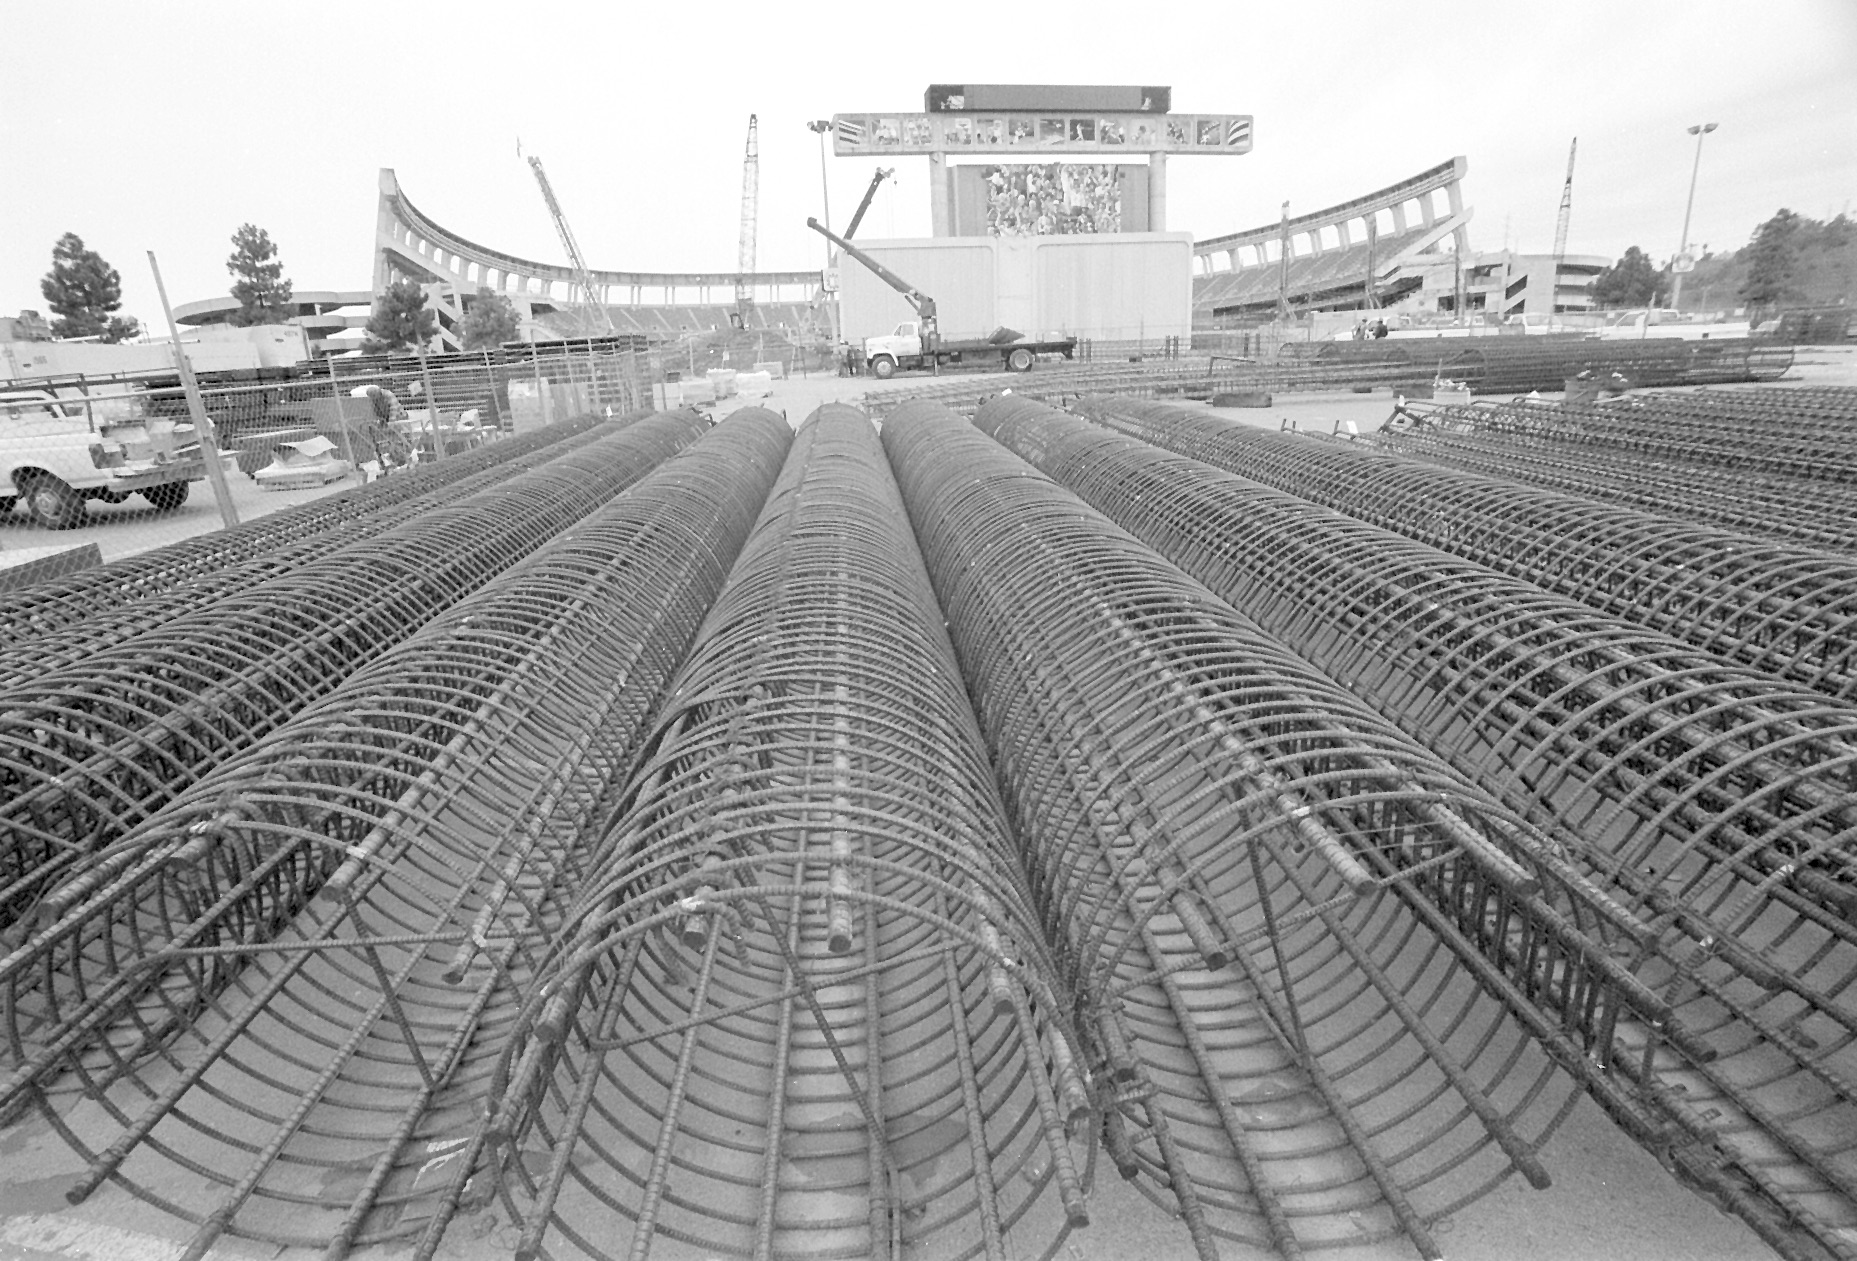 NUCOVER Stadium Expansion